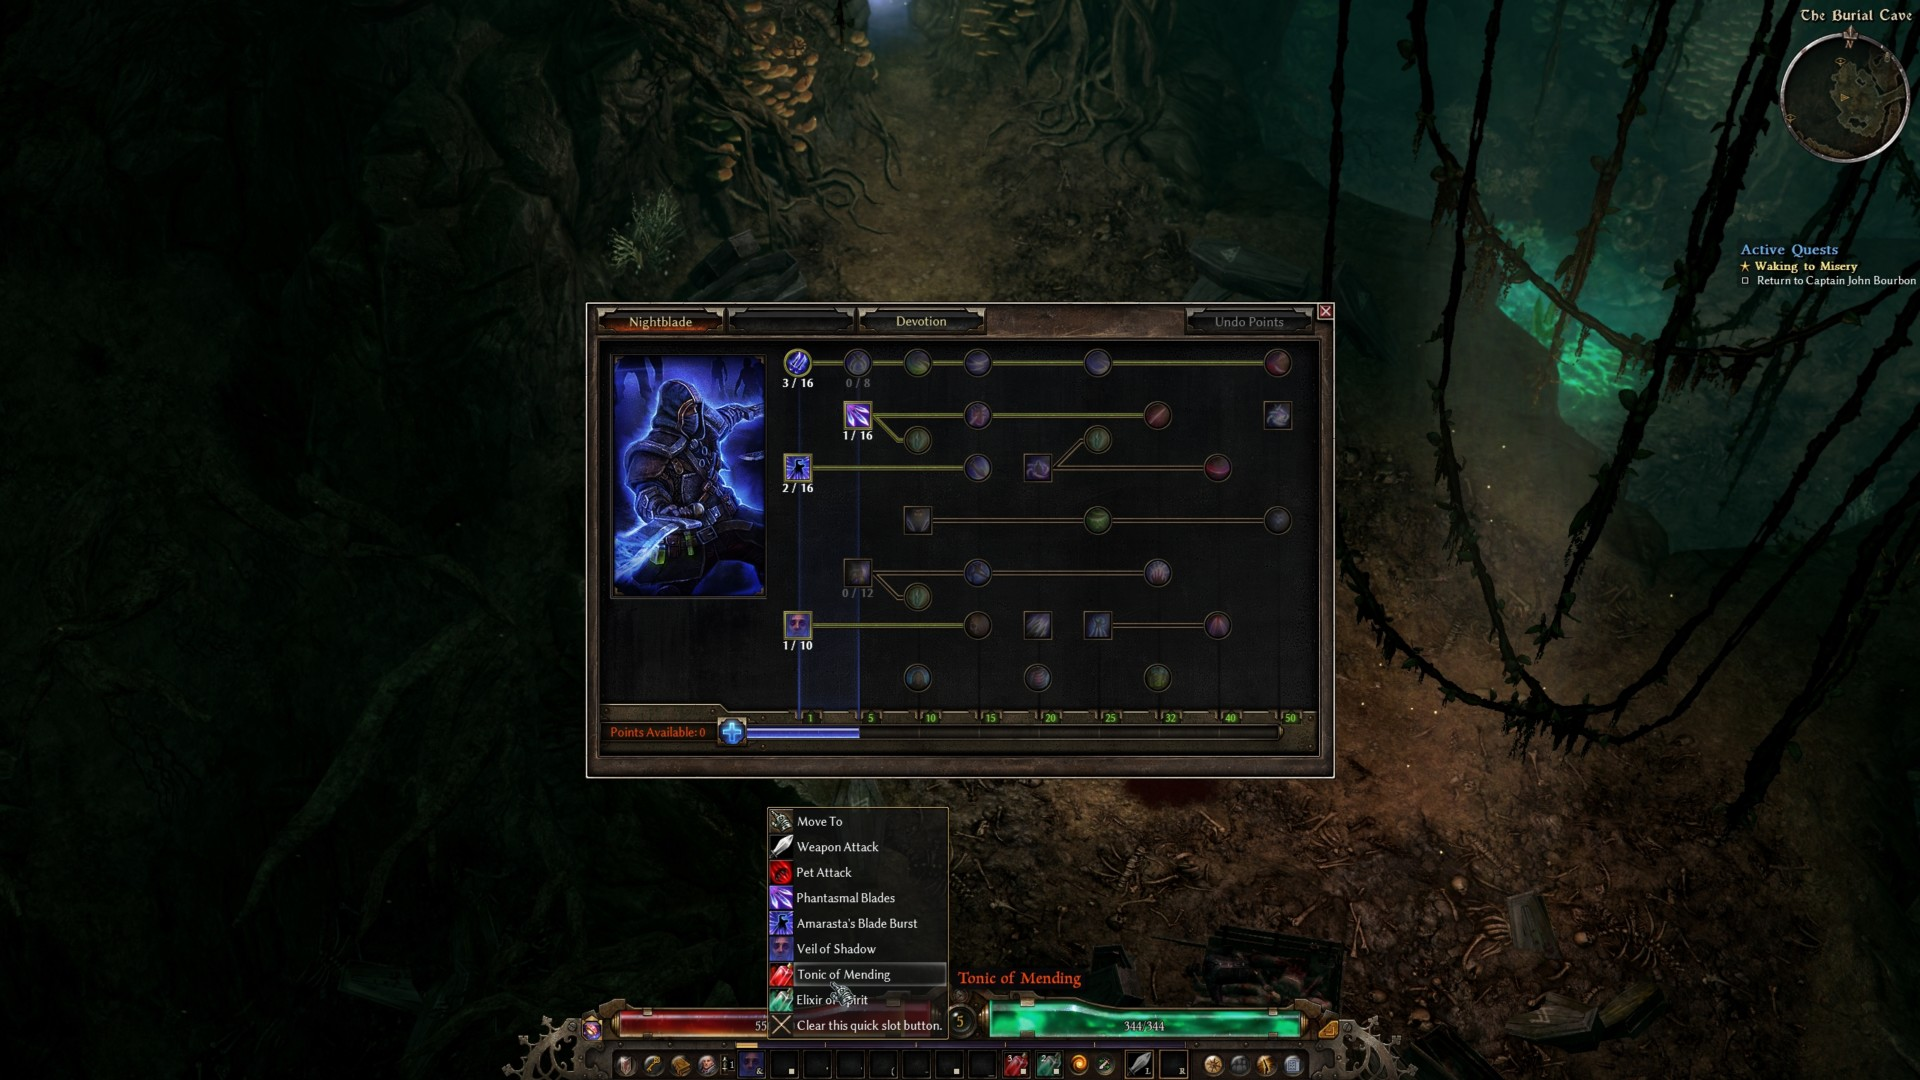 grim-dawn-skill-tree